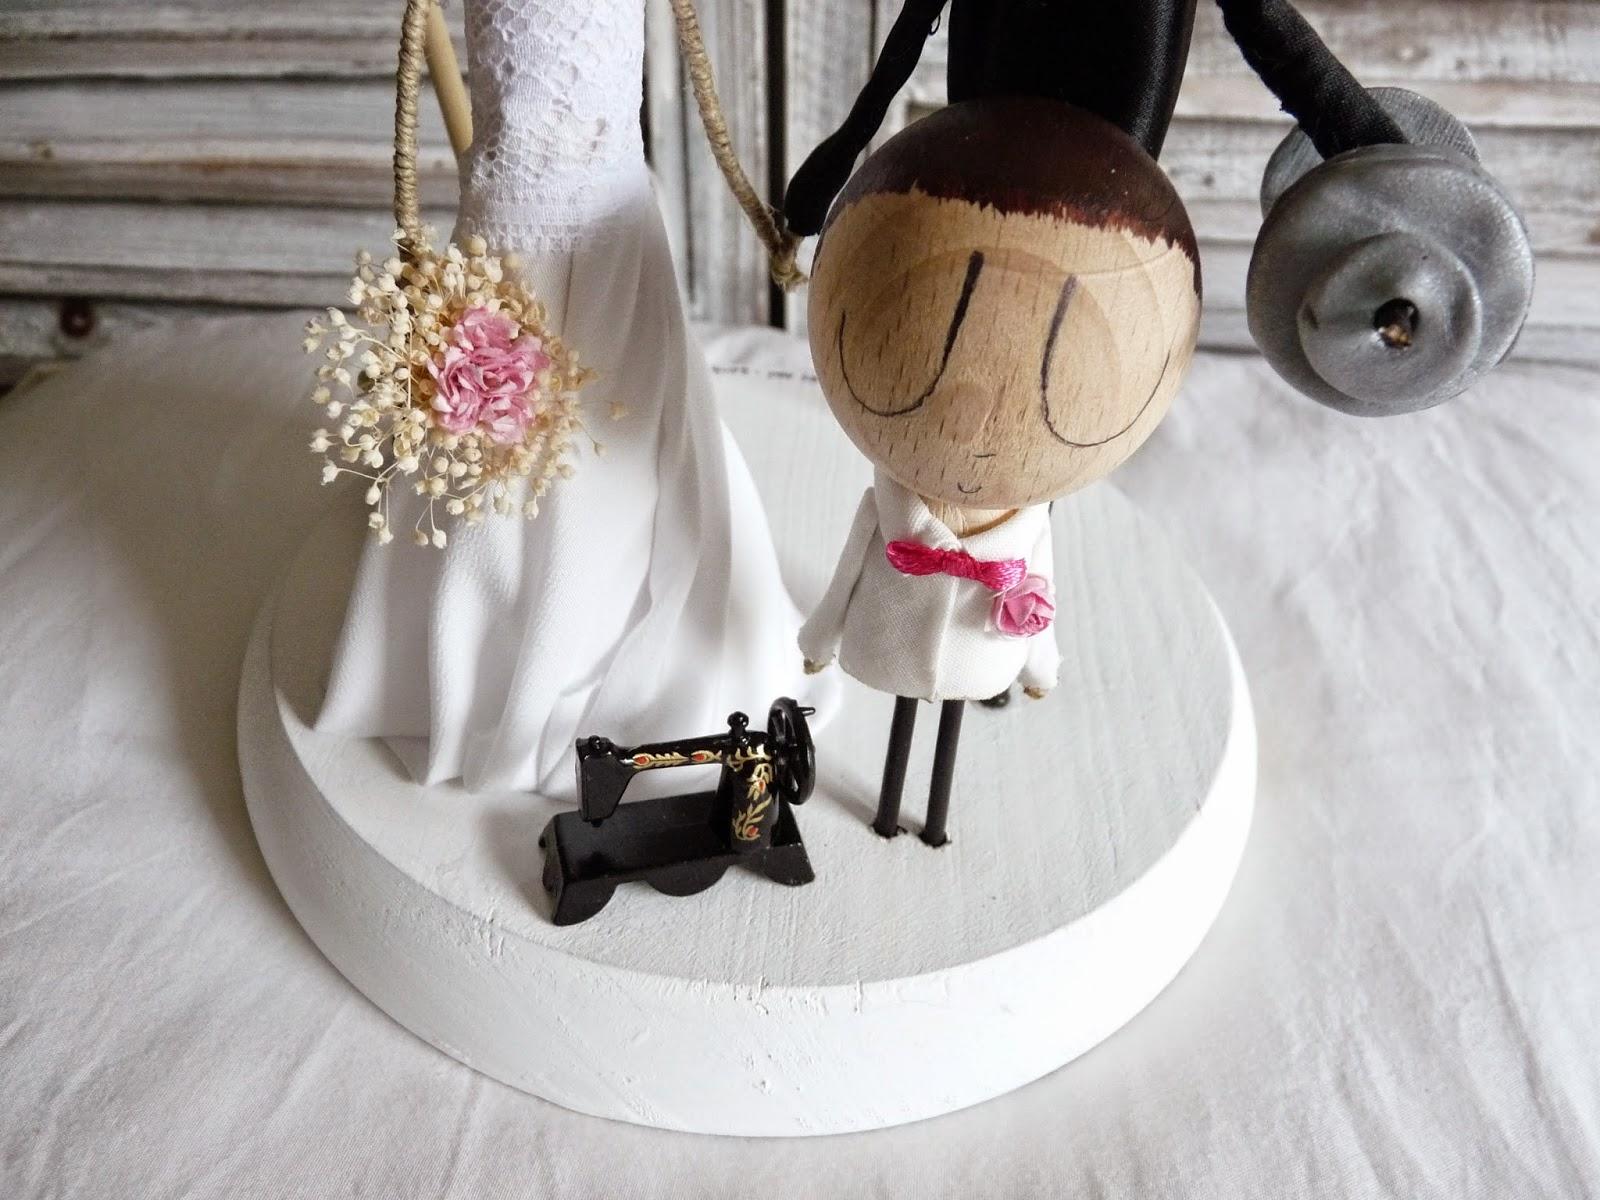 pronovias, novios pastel personalizados, figuras tarta, muñecos pastel, novios, novios originales, novios con encanto, wedding cake, topper cake, cake topper, bride,novia, novio, vestido novia, muñecos pastel personalizados, tarta boda, pastel nupcial, prometidos, nos casamos, novios de pastel elegante, con encanto, maleta, viaje de novios, ramo de novia, peinado novia, corbata novio, restaurante bodas, mrymrsbyani, mr&mrsbyani, wedding topper cake, cymbeline